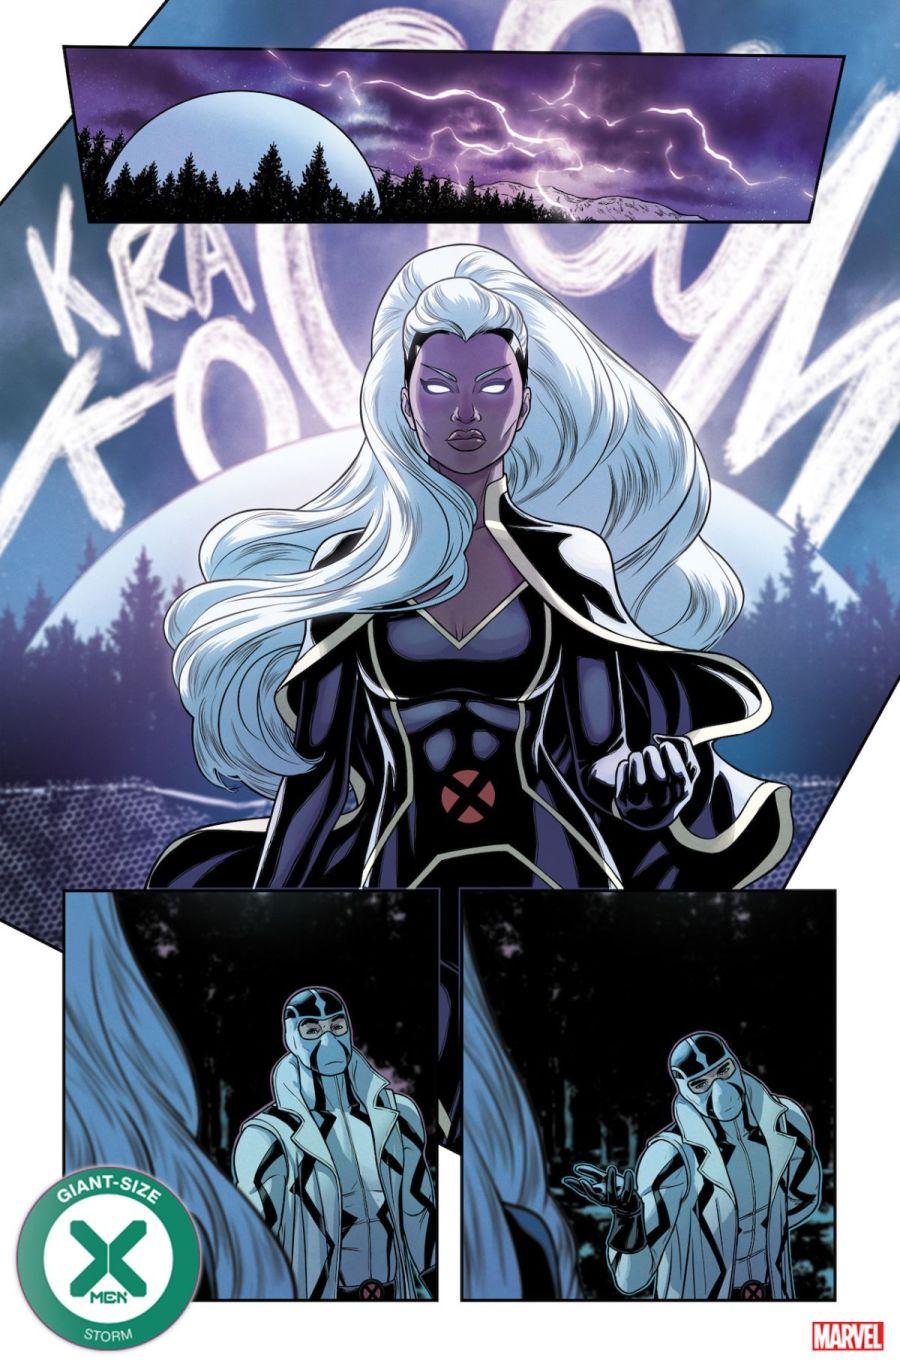 Giant- Size X-Men Storm #1